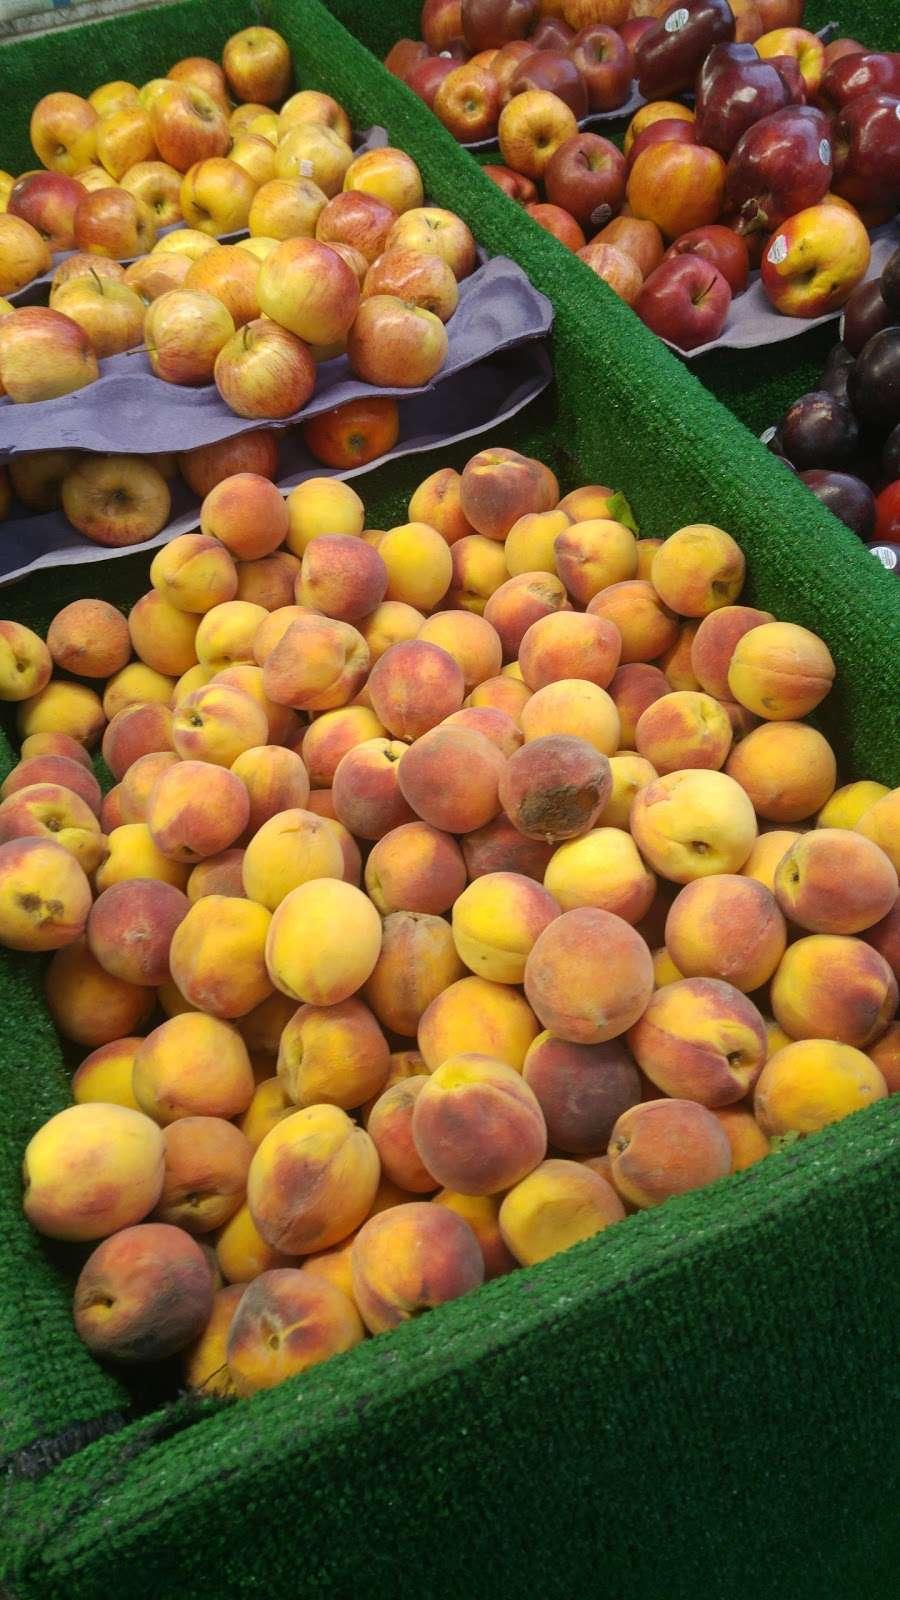 Raskins Fruit & Produce - store    Photo 2 of 10   Address: 335 Kingston Ave, Brooklyn, NY 11213, USA   Phone: (718) 756-3888